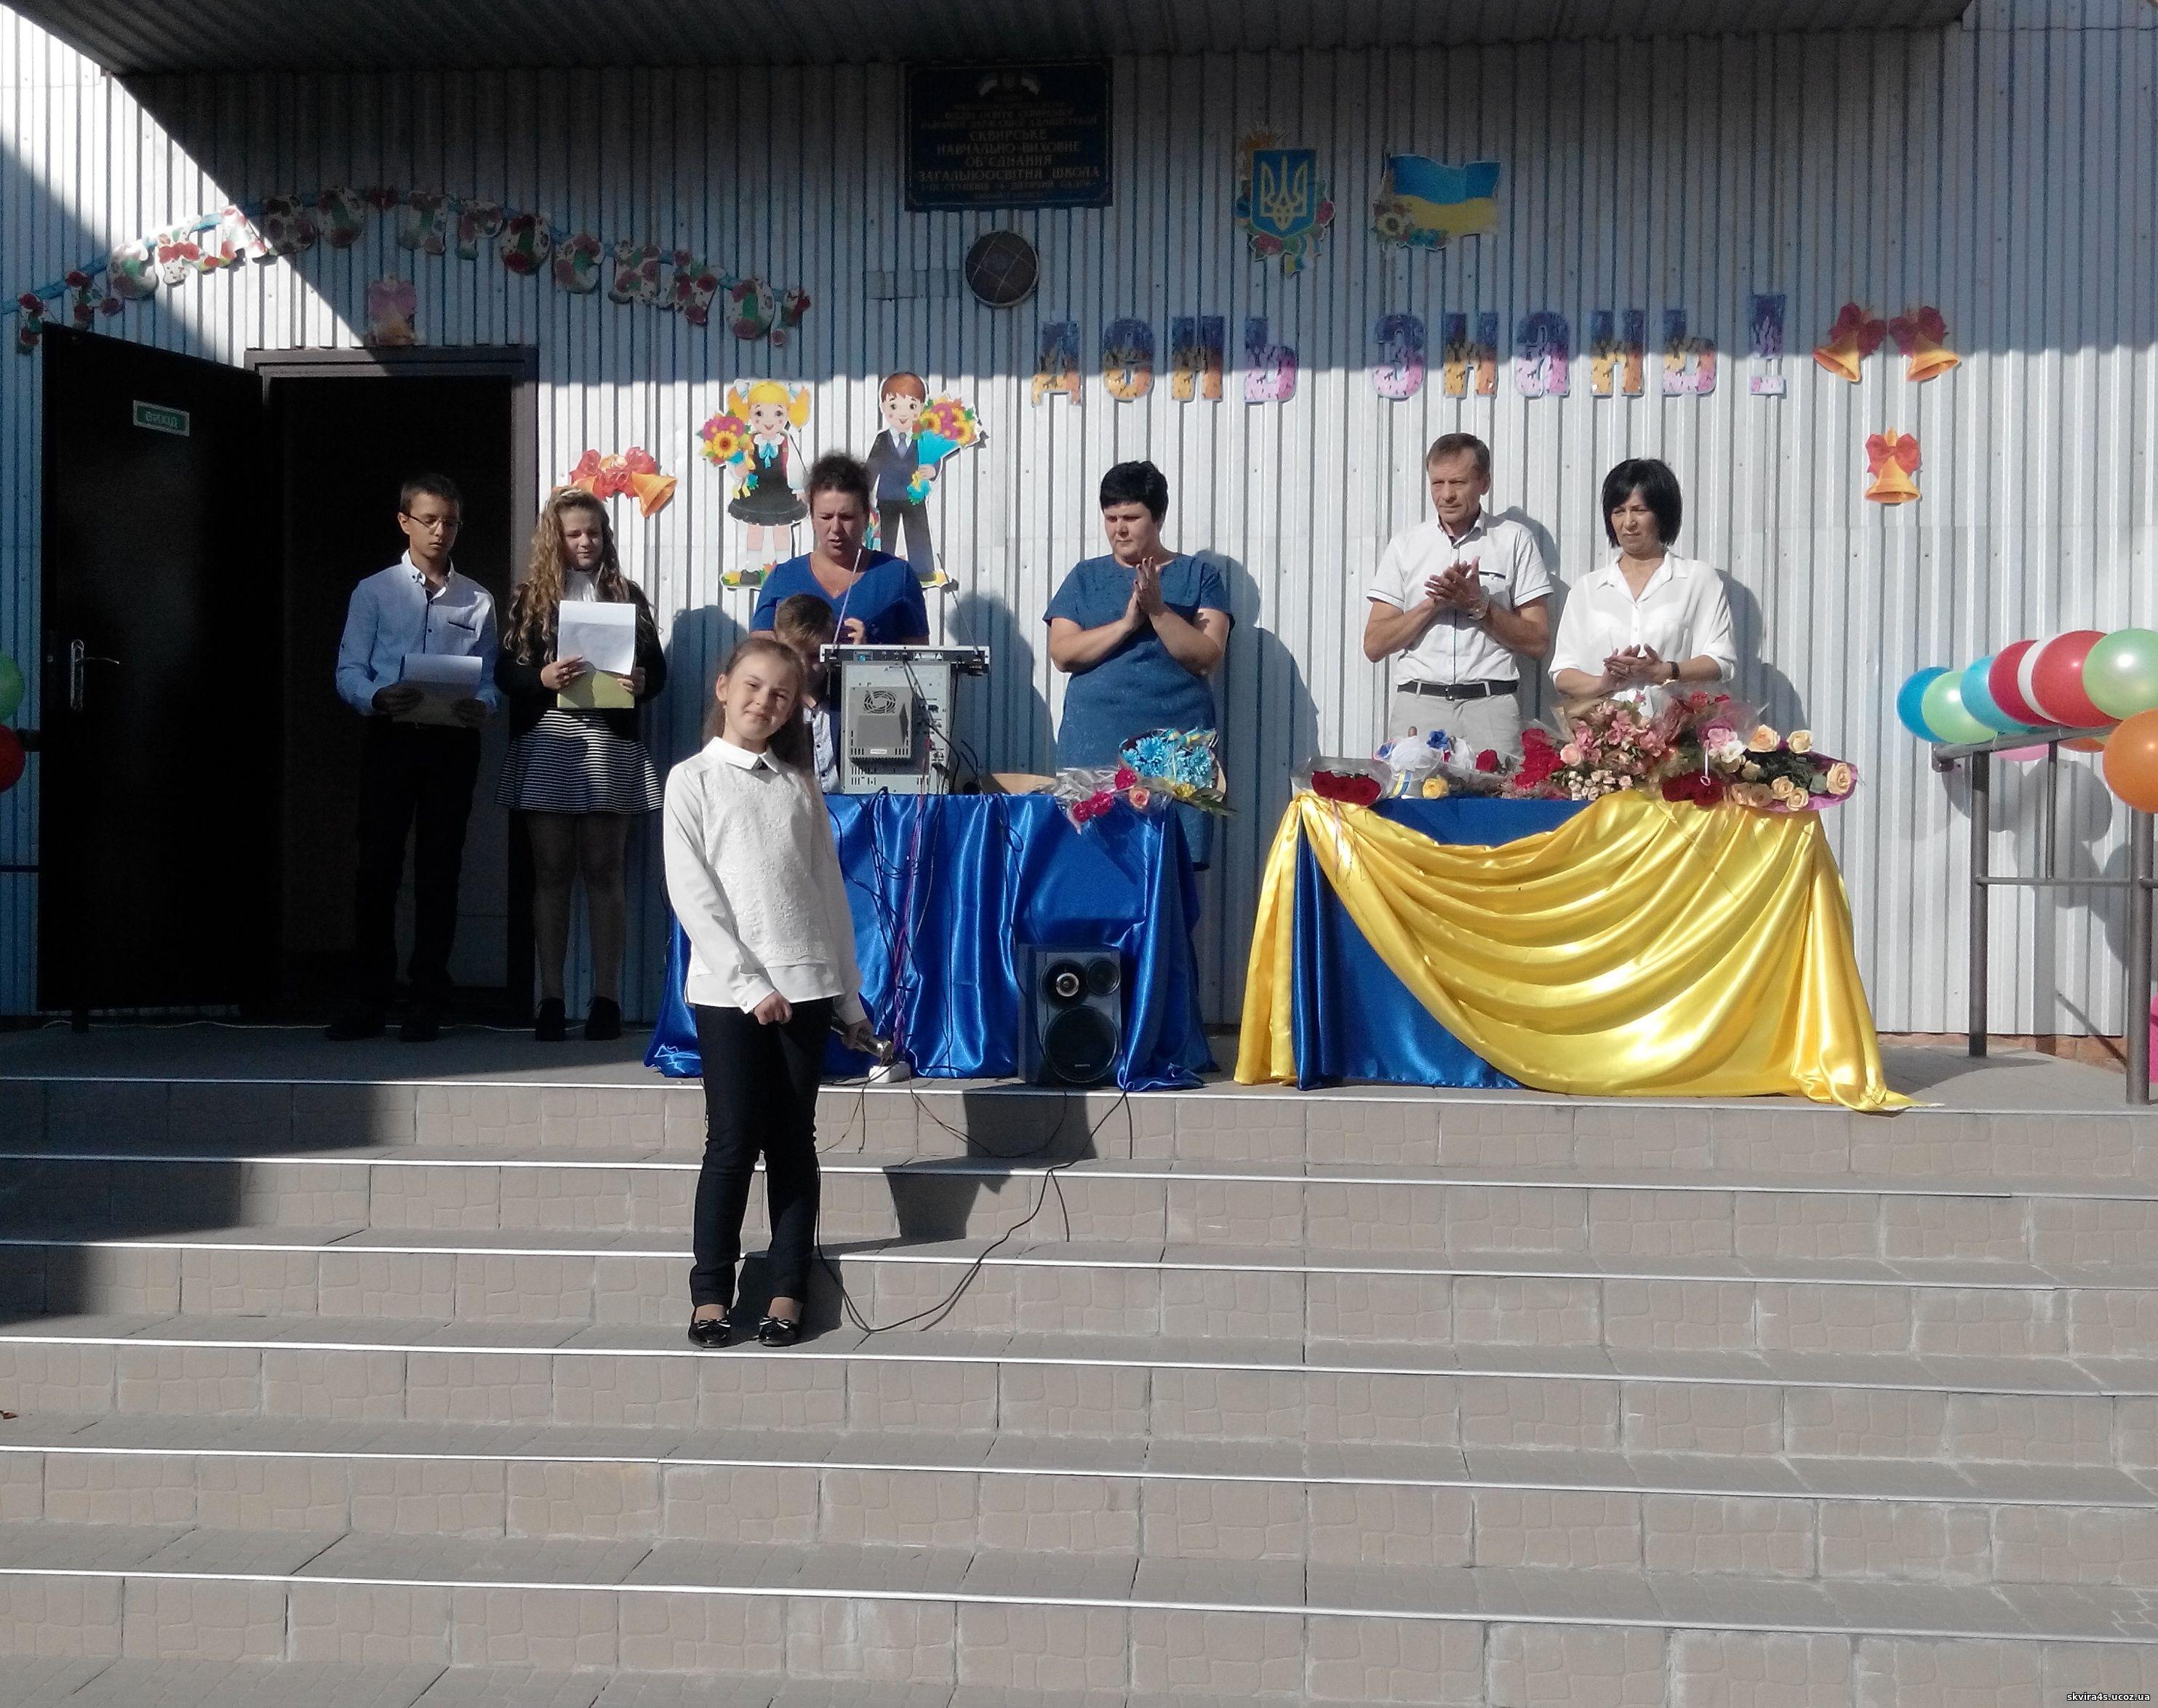 http://skvira4s.ucoz.ua/foto/01-09-2017/2017901092302.jpg